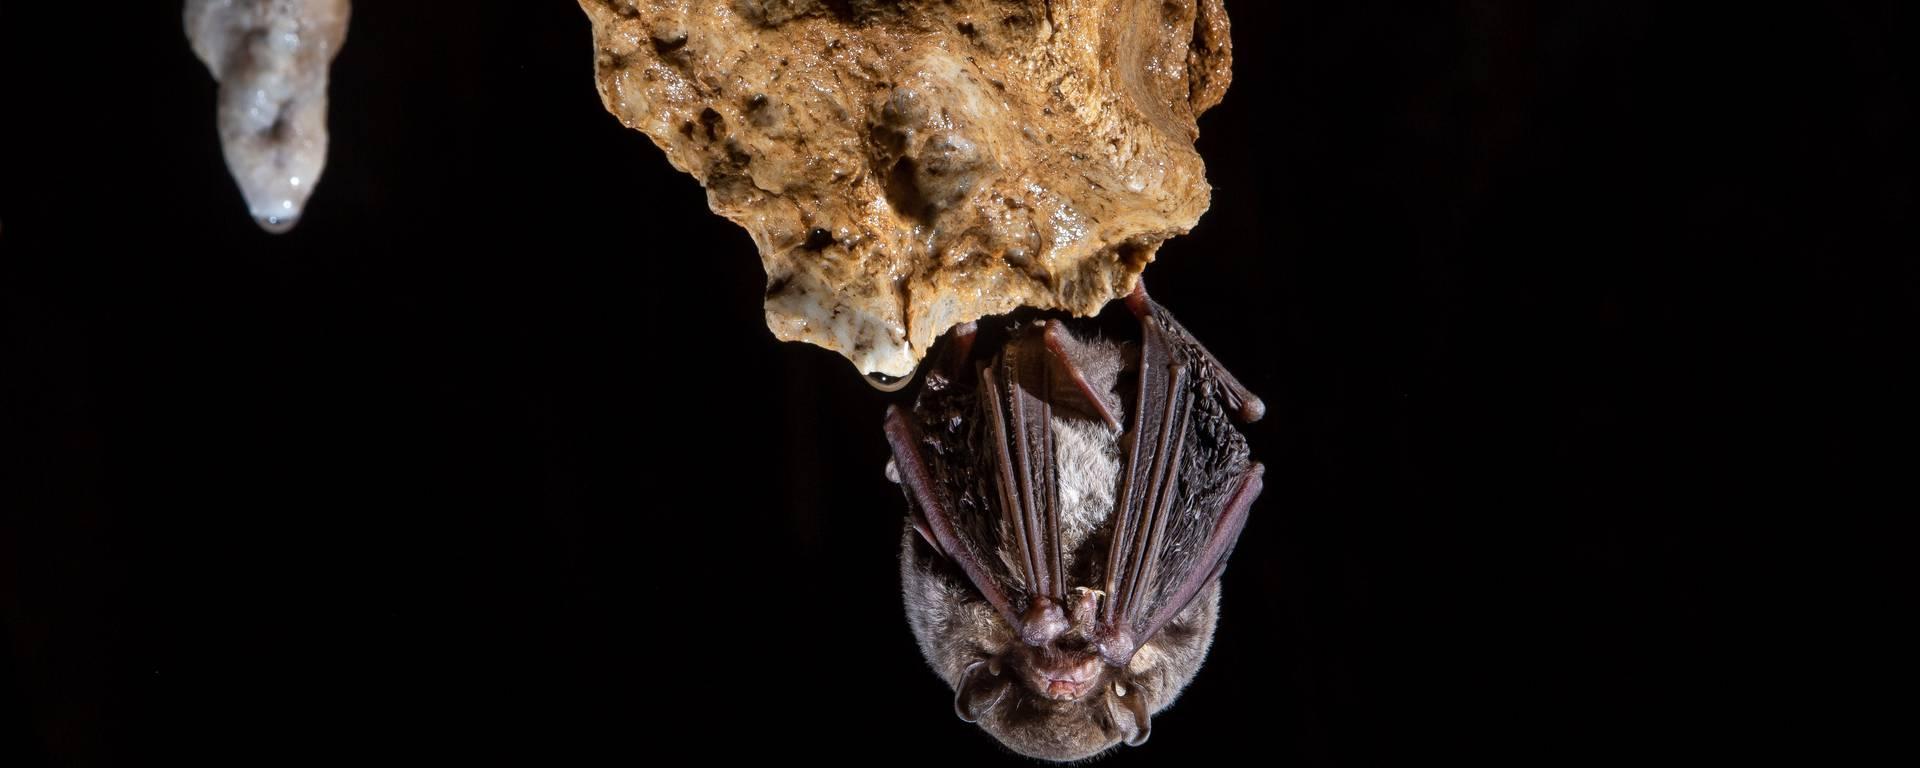 Minioptère de Schreibers / Grotte d'Olquette©A.Alliès-PHLV